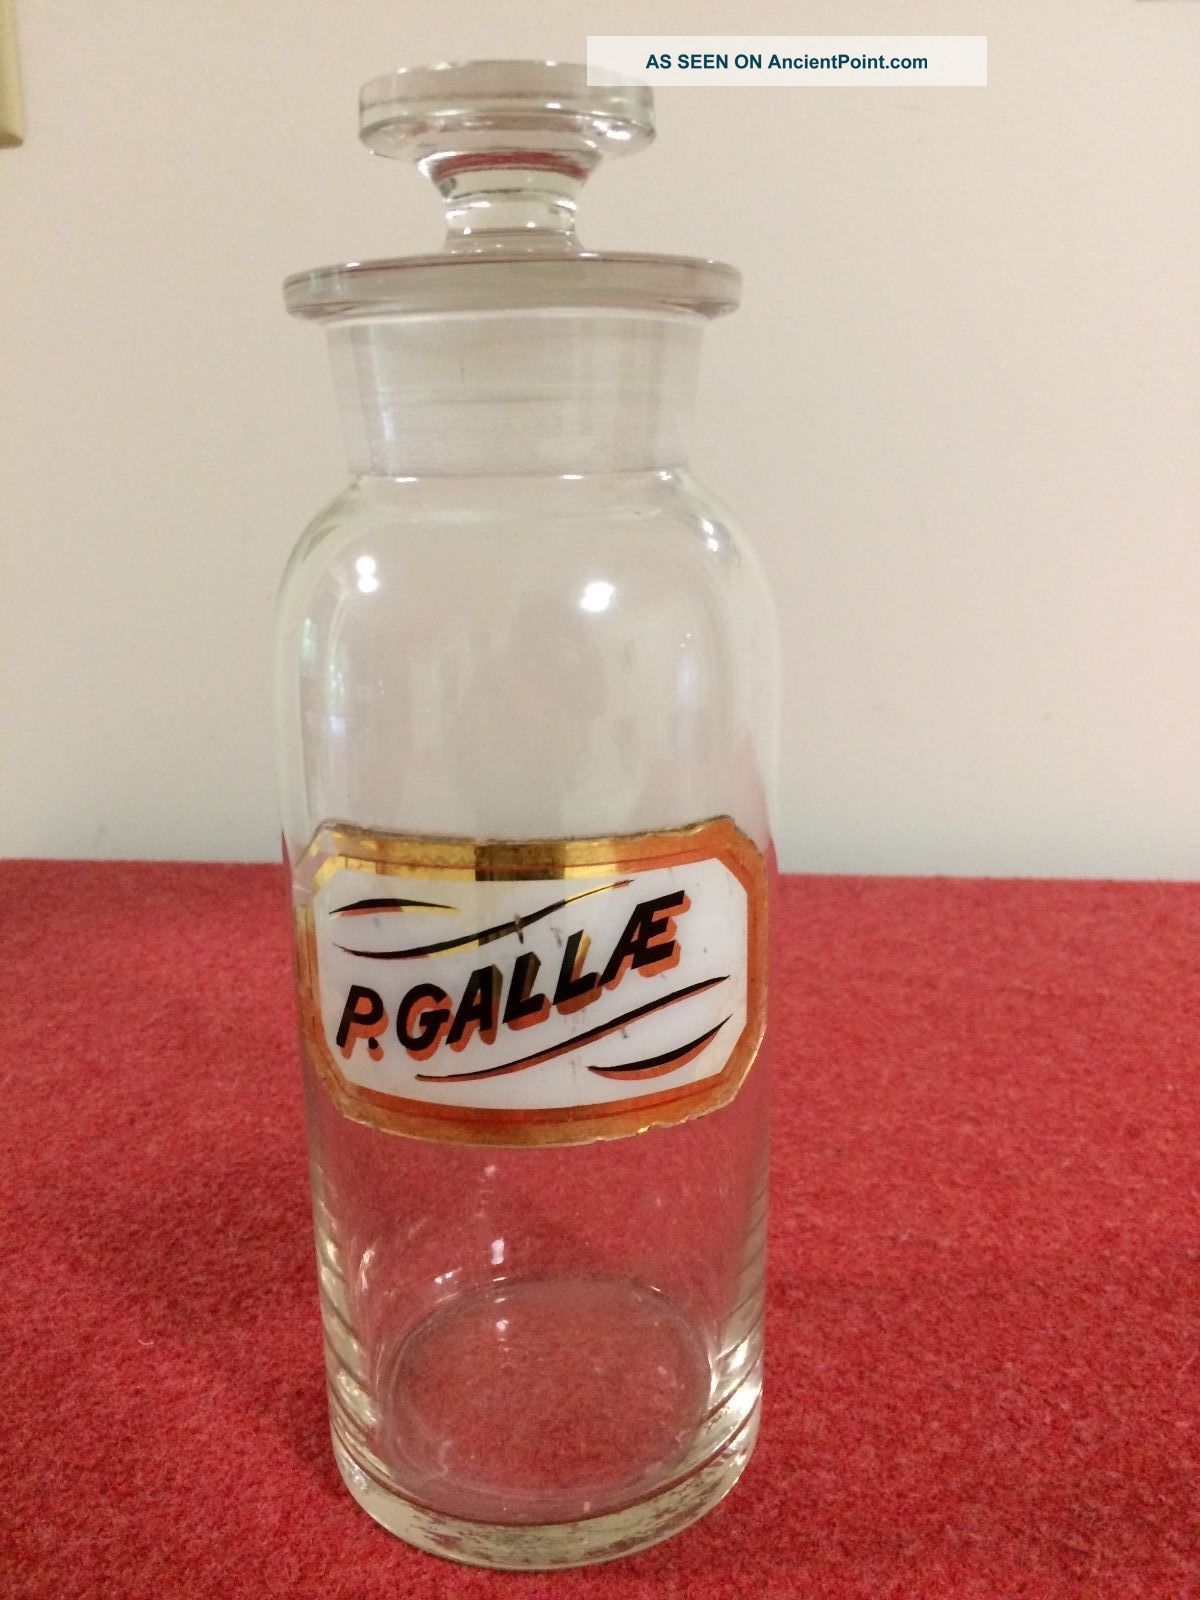 Vintage P.  Gallae Apothecary Glass Bottle W/stopper Bottles & Jars photo